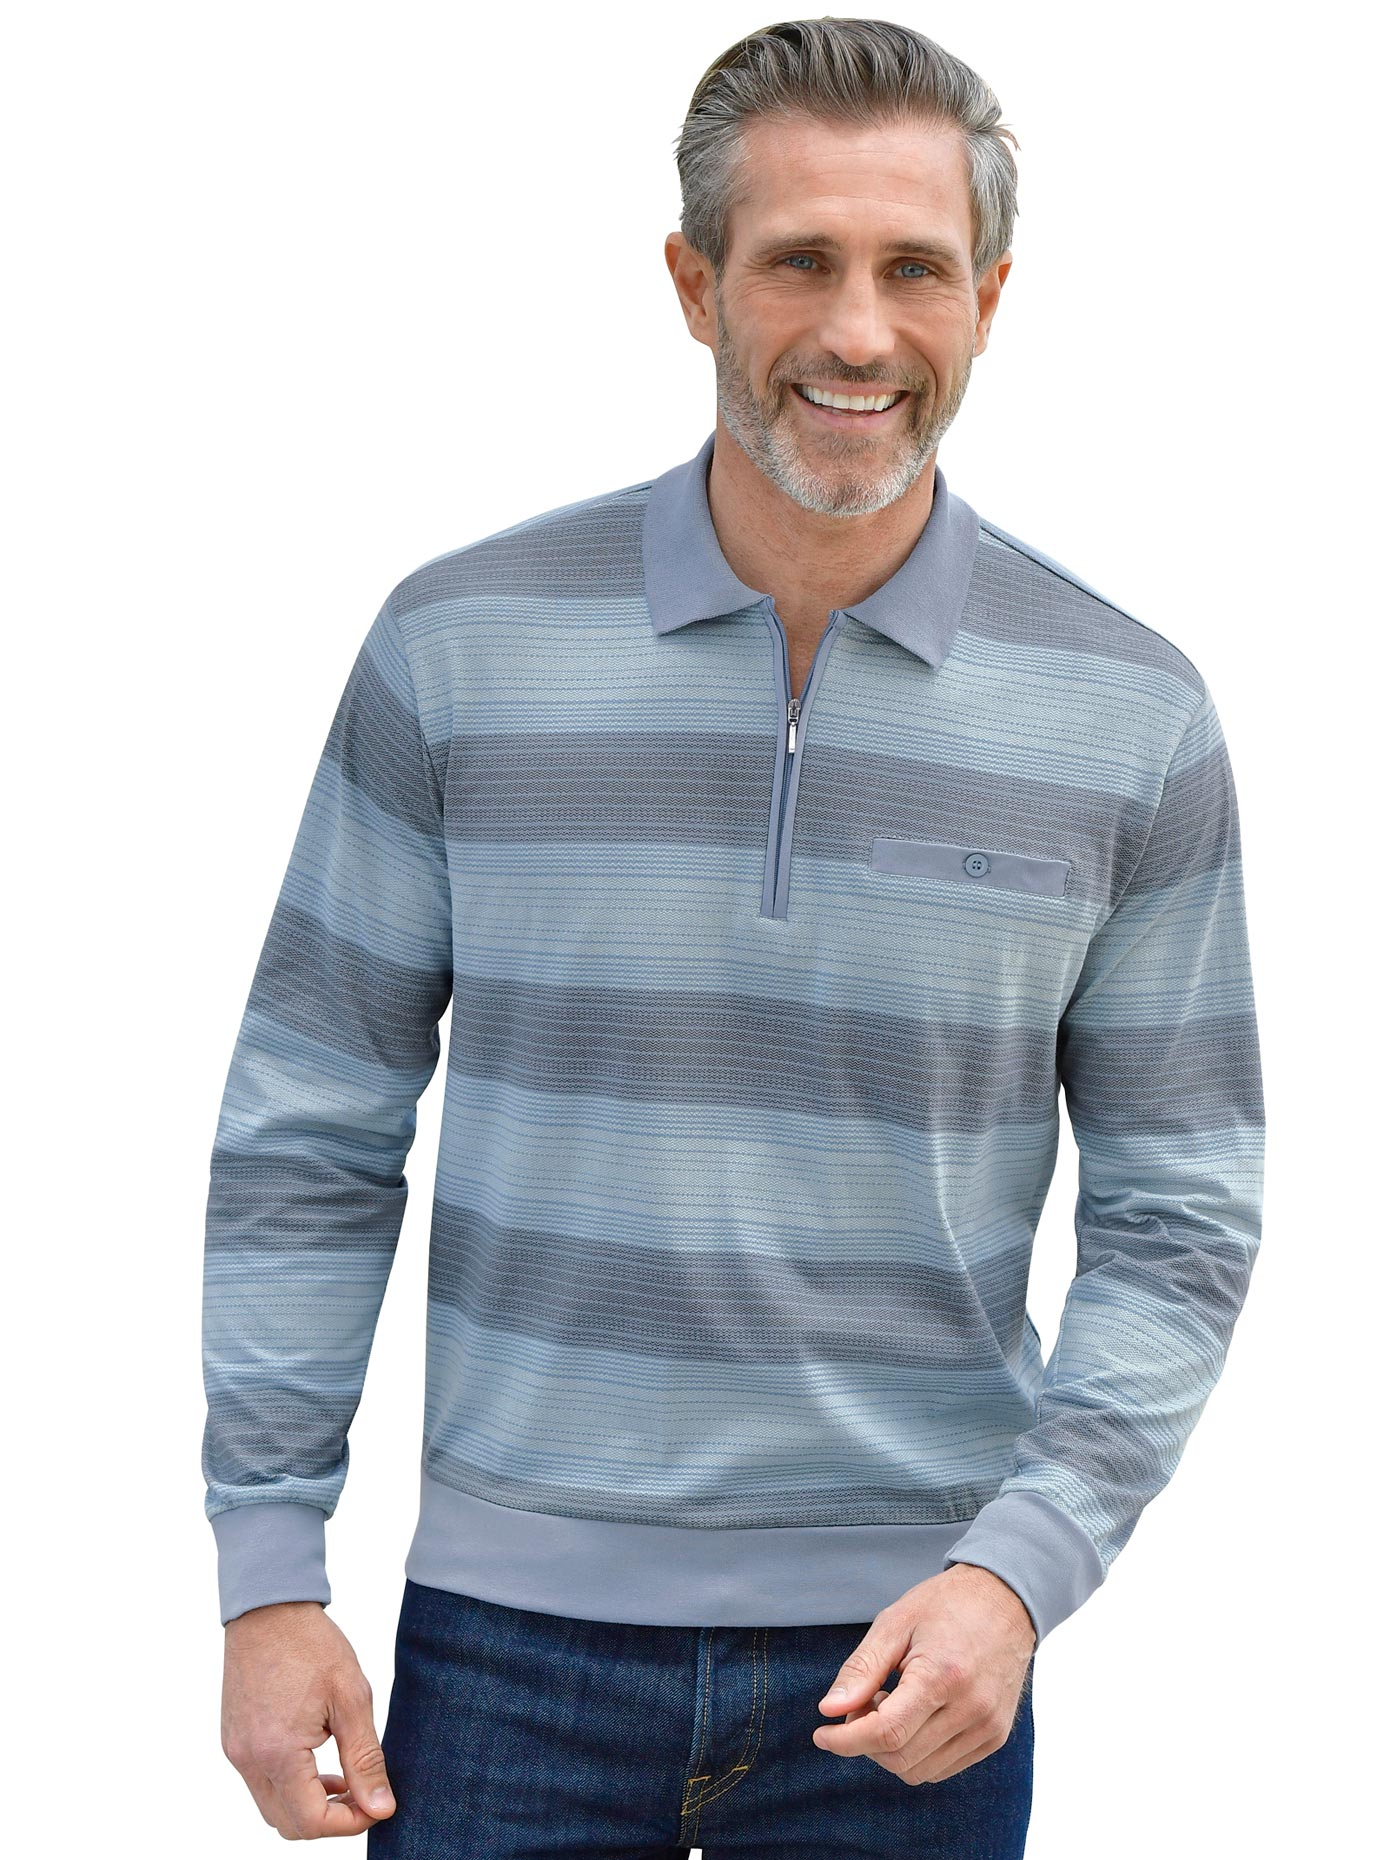 Marco Donati Langarm-Shirt mit flächigem Druck | Bekleidung > Shirts > Langarm Shirts | marco donati